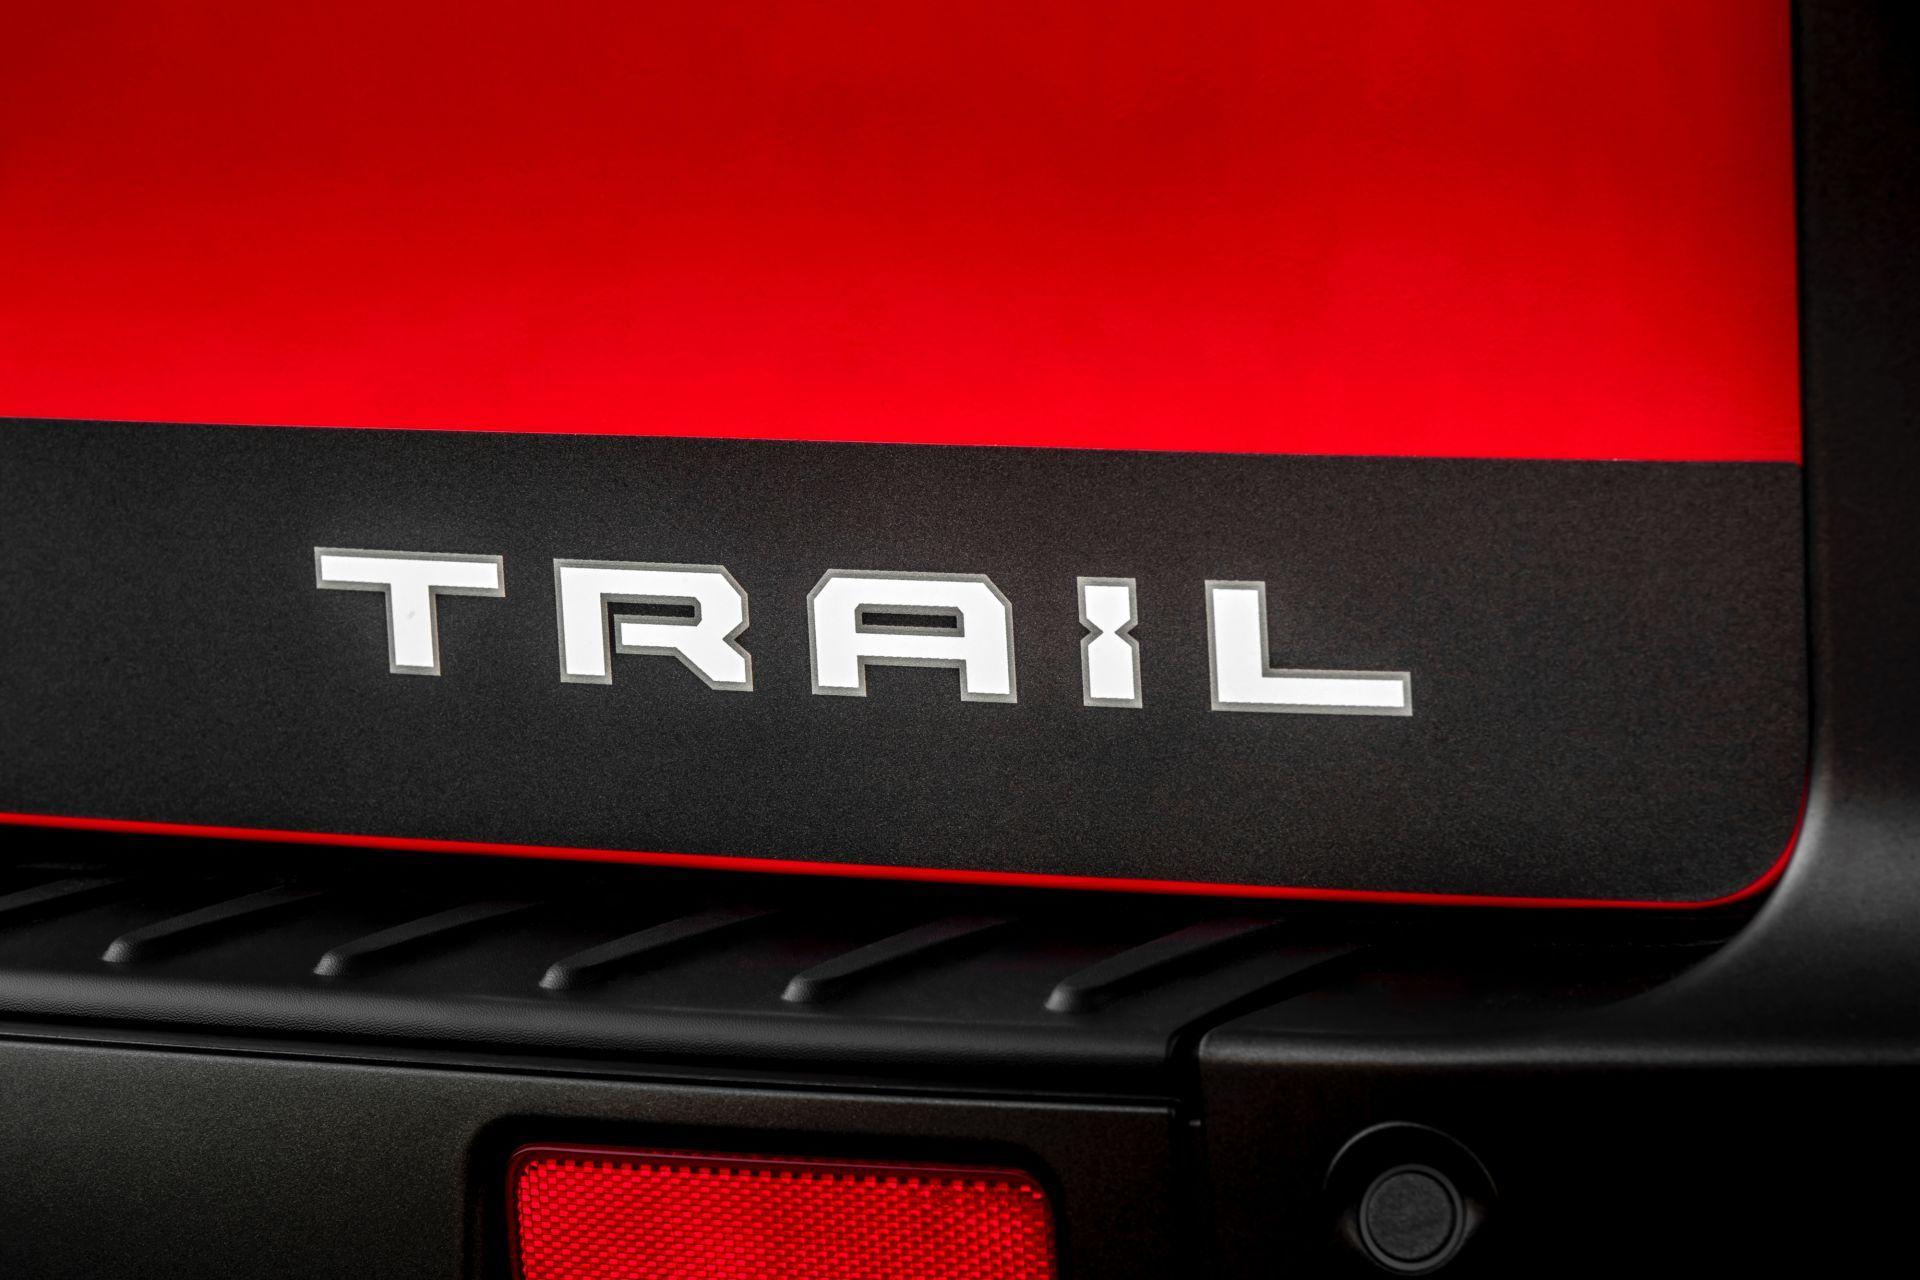 2021-Ford-Transit-Custom-Trail-Euro-spec-11